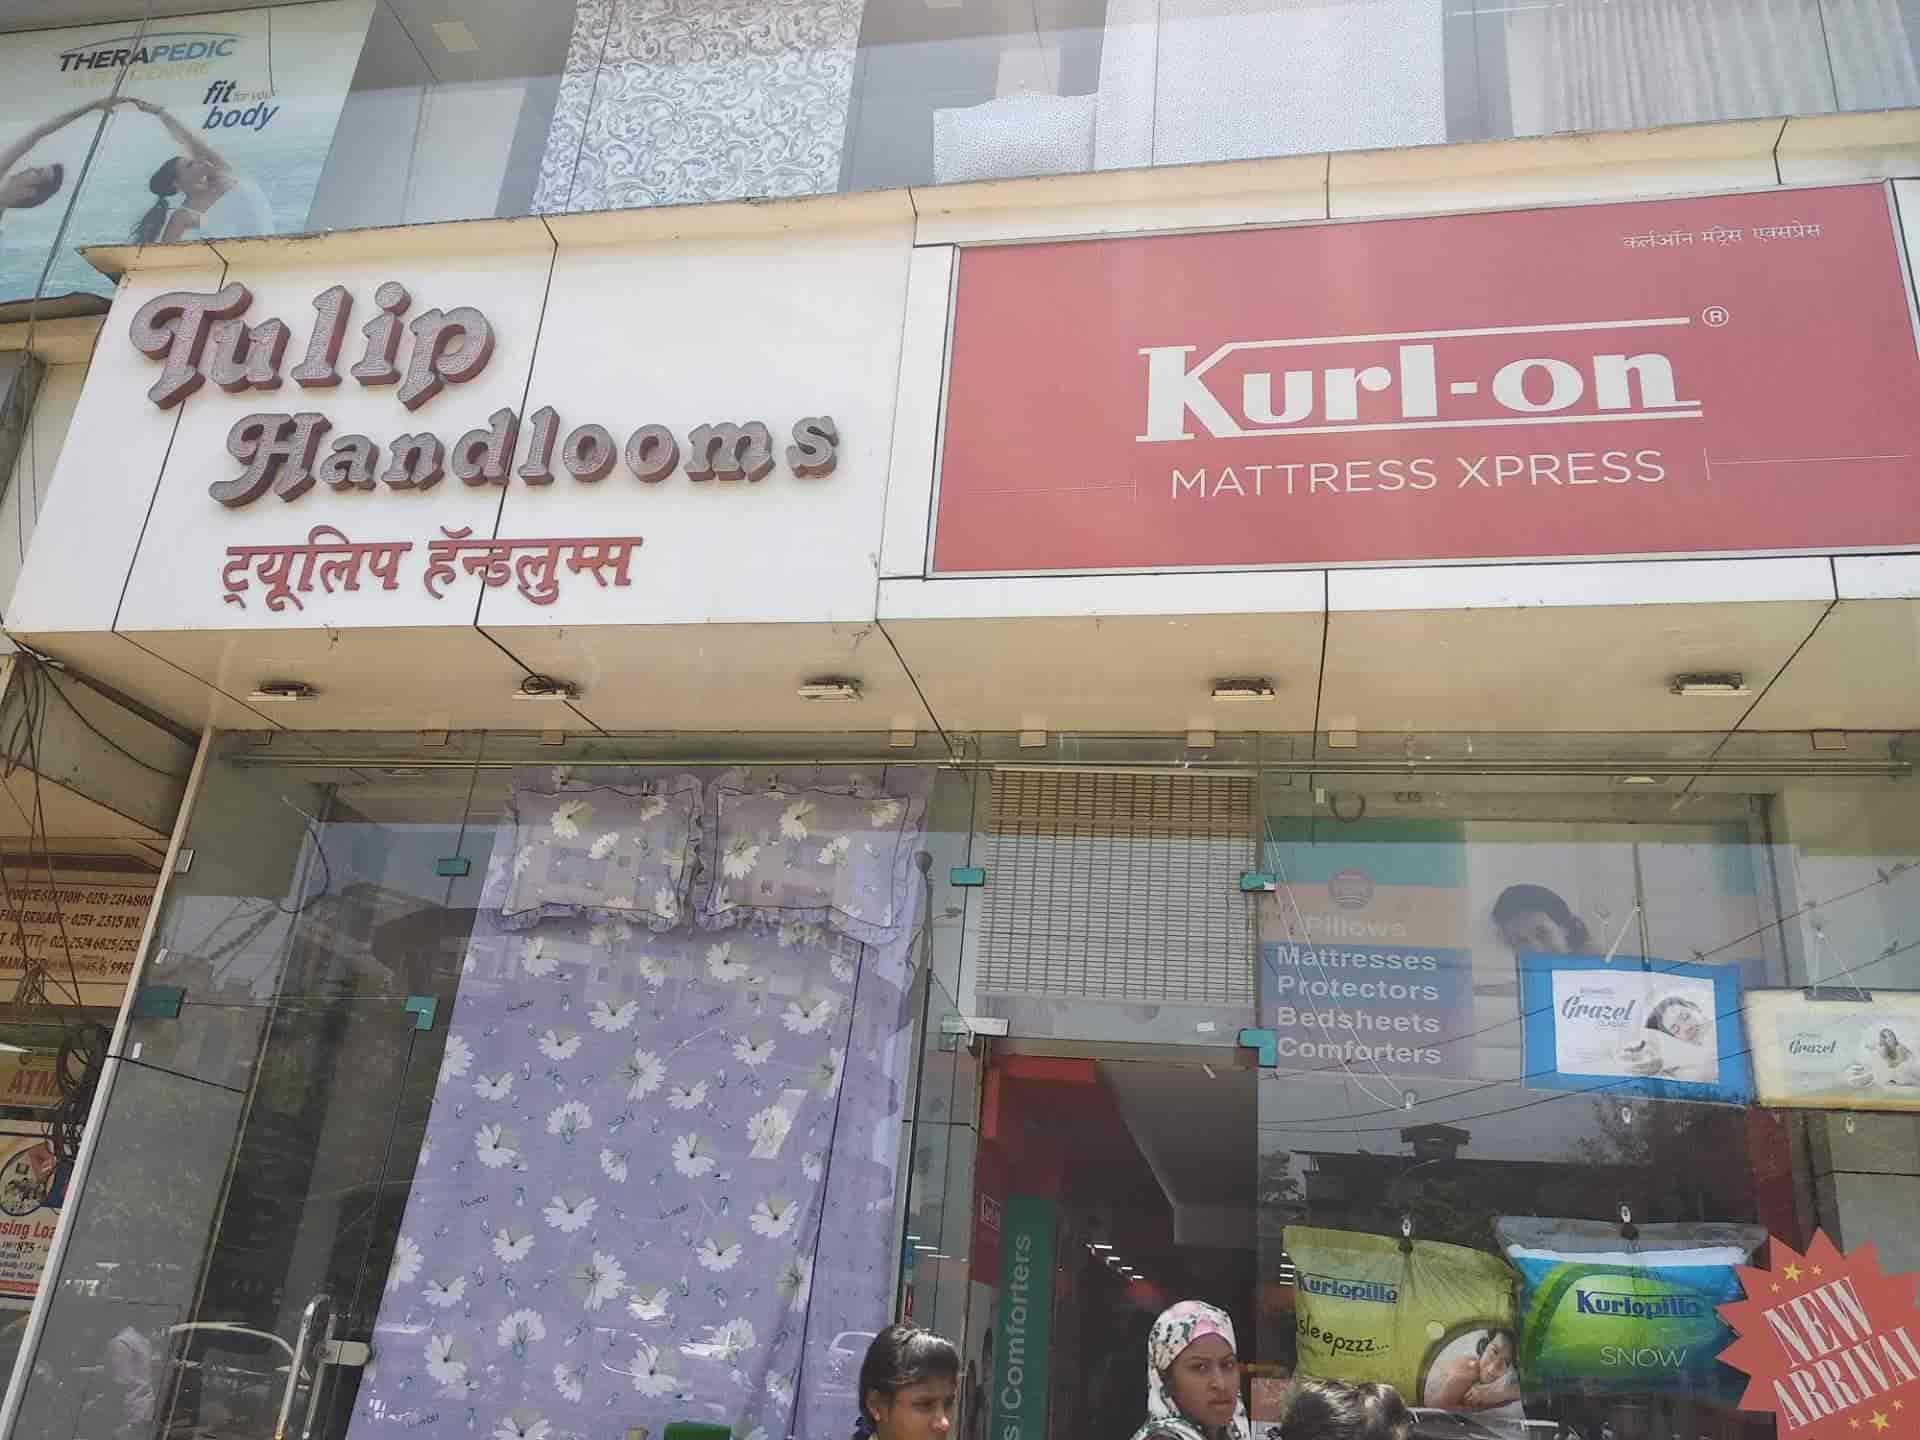 Tulip Handlooms, Kalyan City - Mattress Dealers in Thane